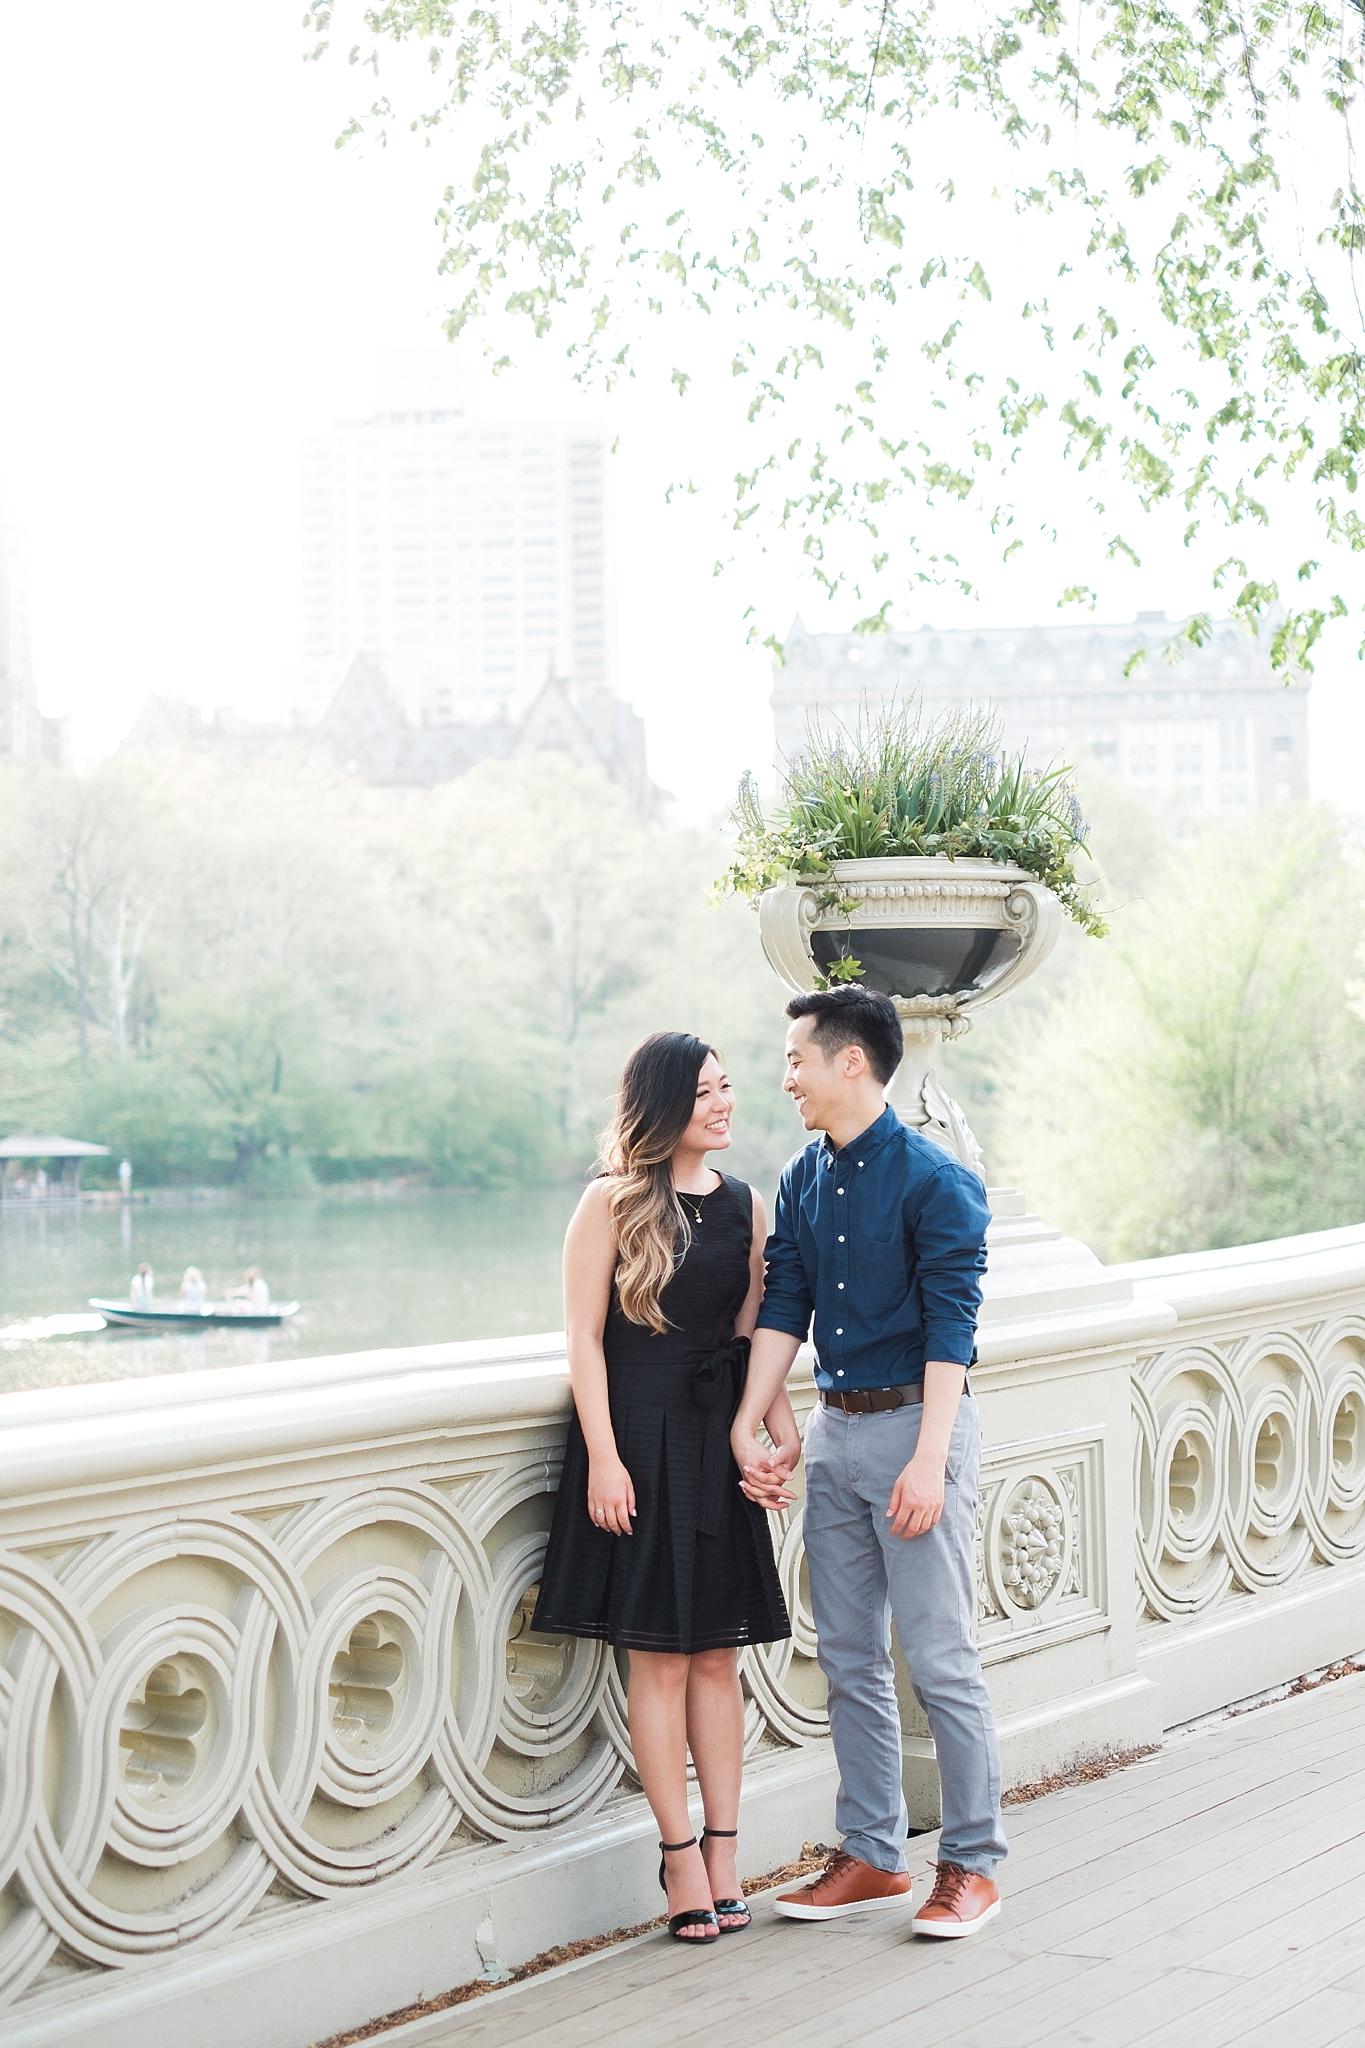 SHARON + STEVEN  Central Park Engagement